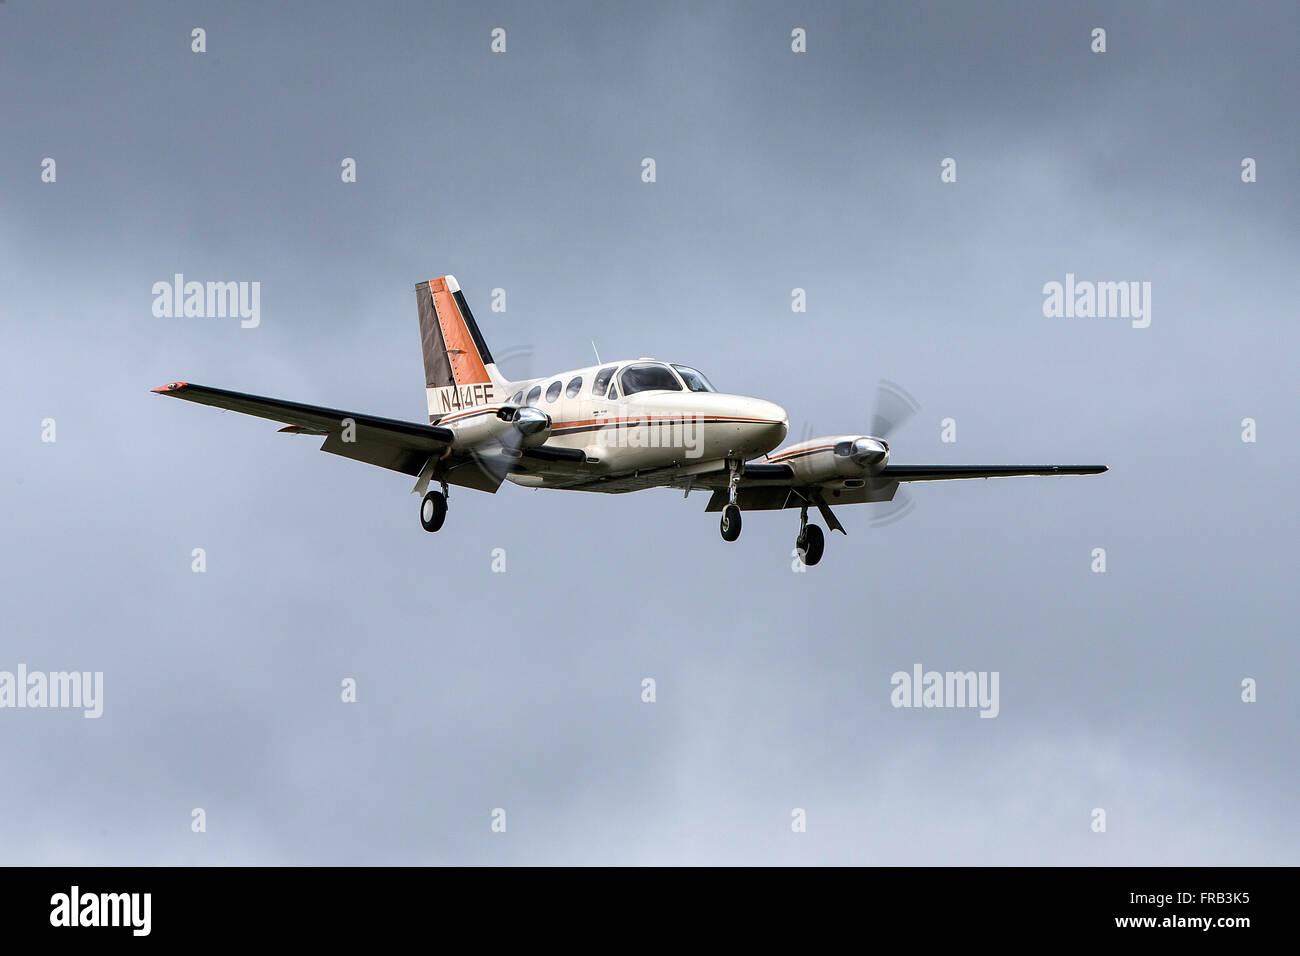 Cessna 414A Chancellor (registration N414EE) landing at Palo Alto Airport (KPAO), Palo Alto, California, United - Stock Image